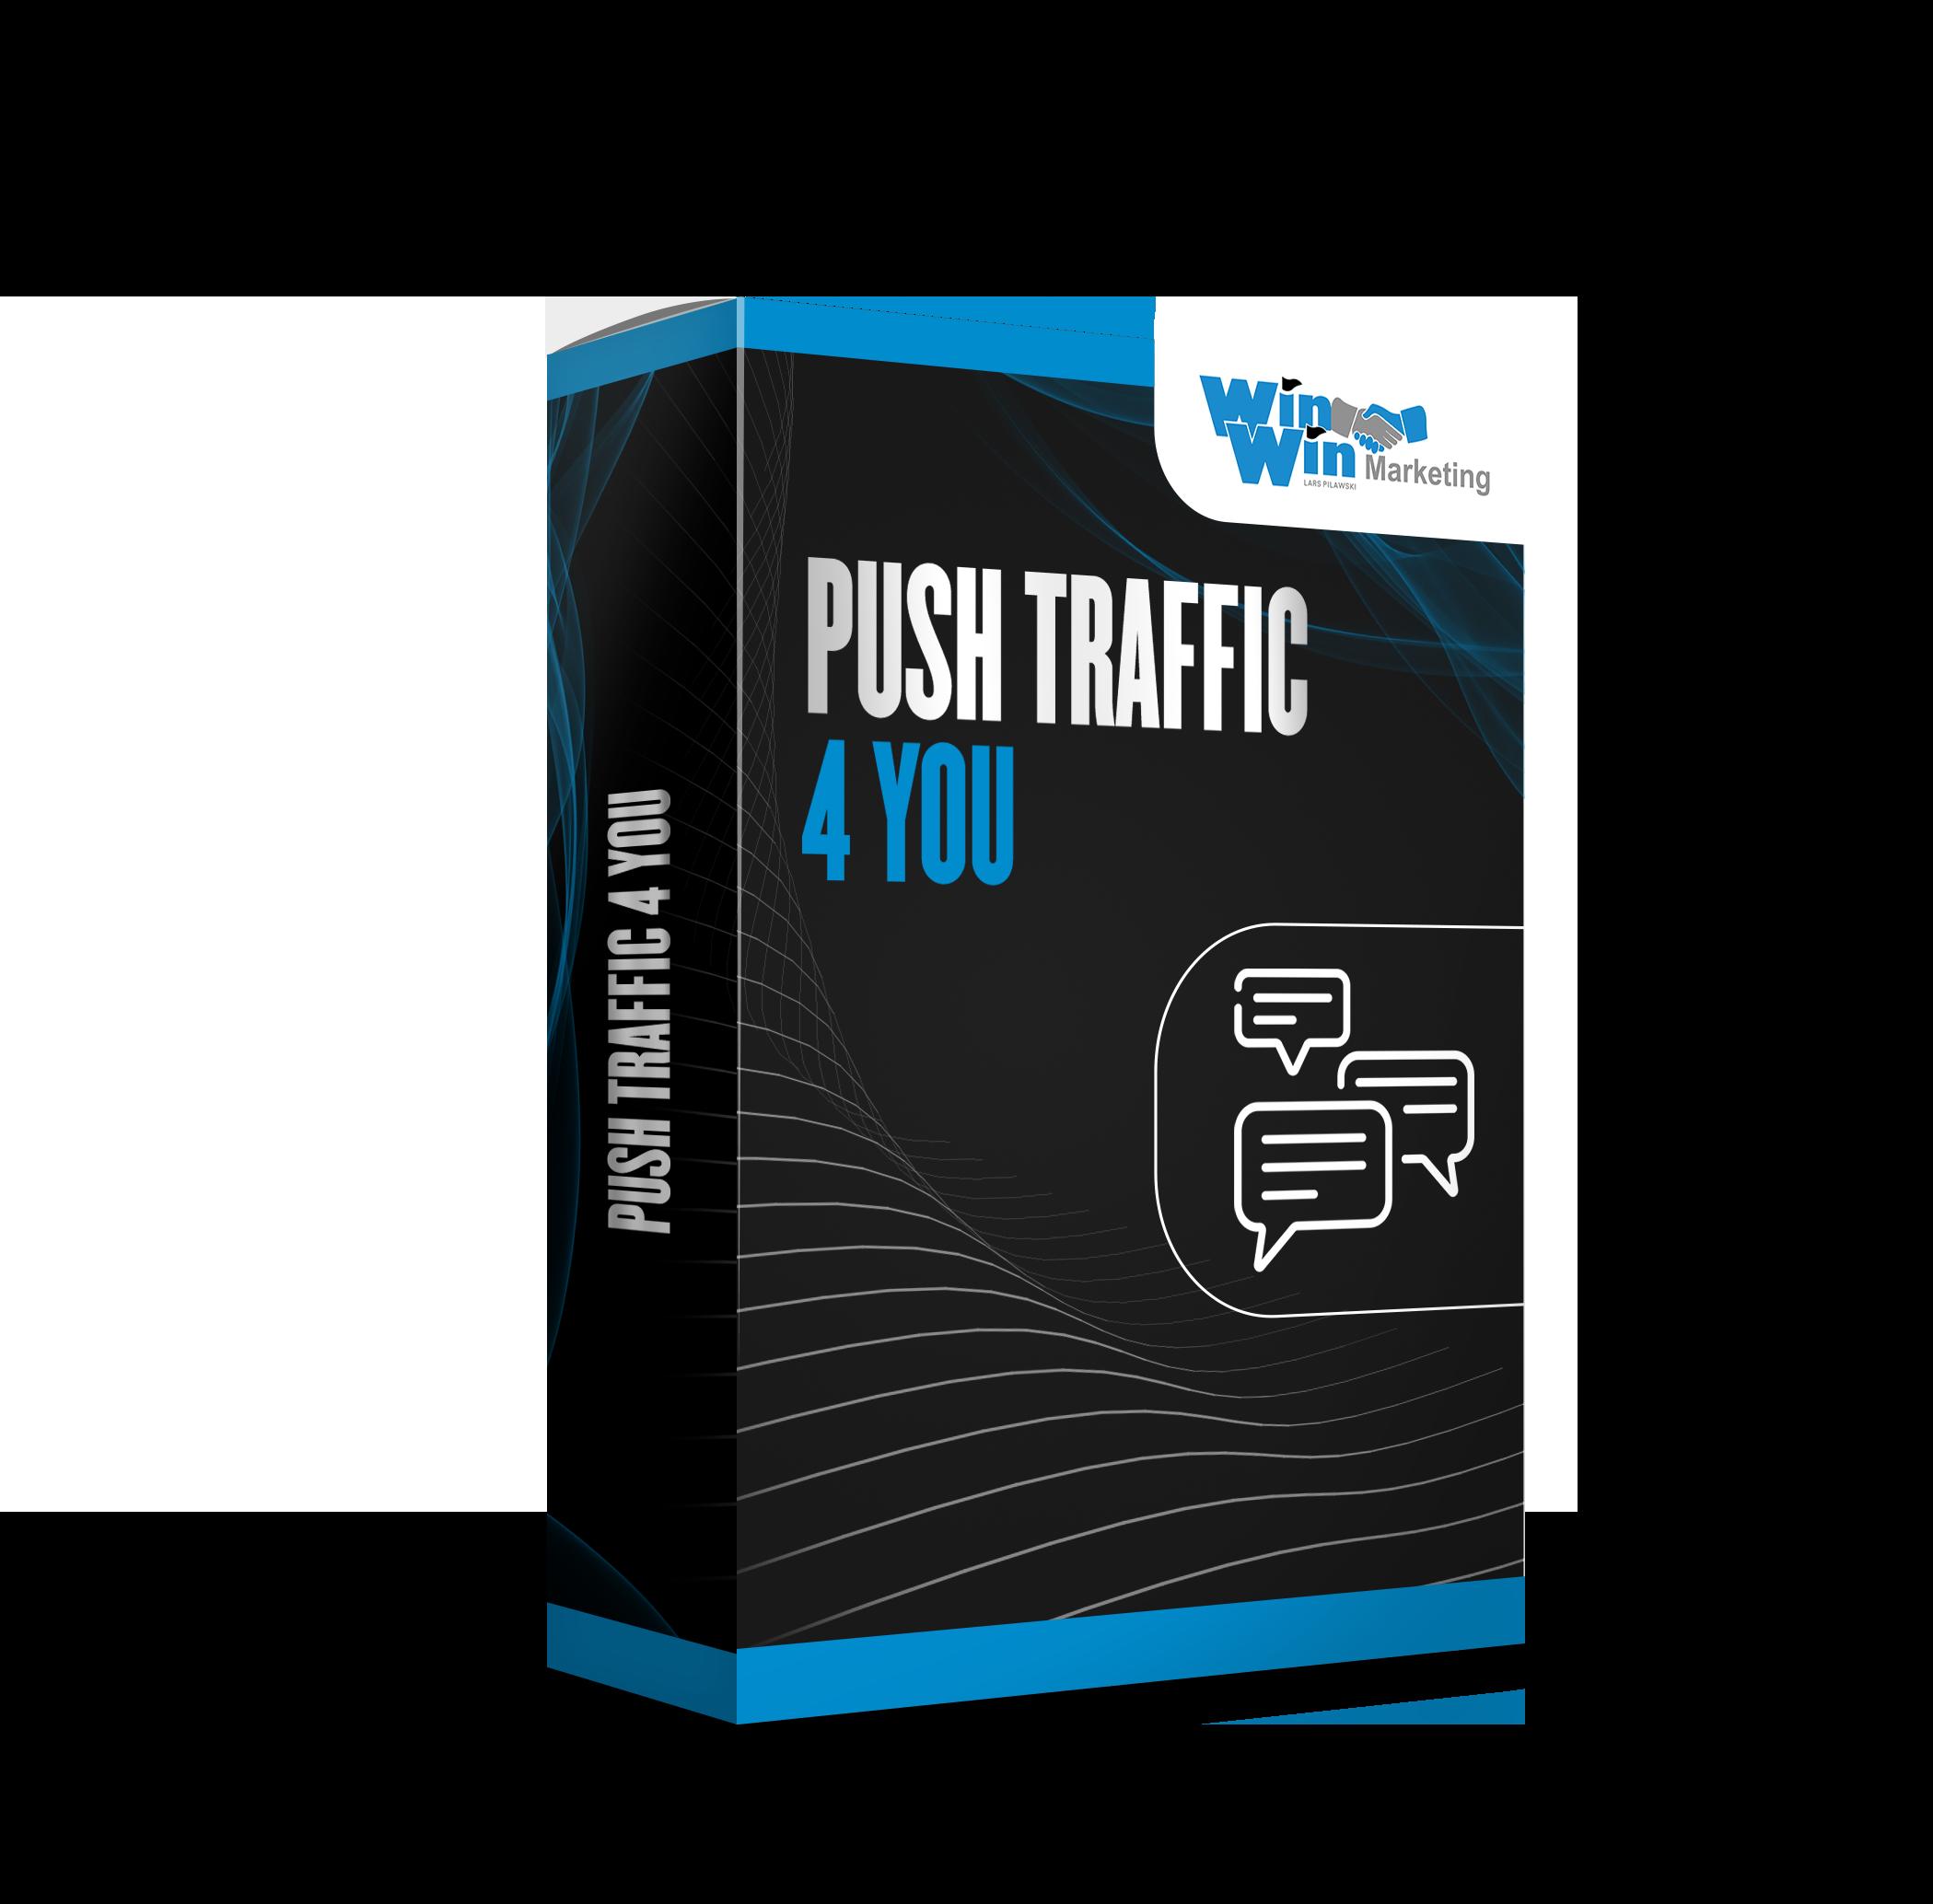 Push Traffic 4 you